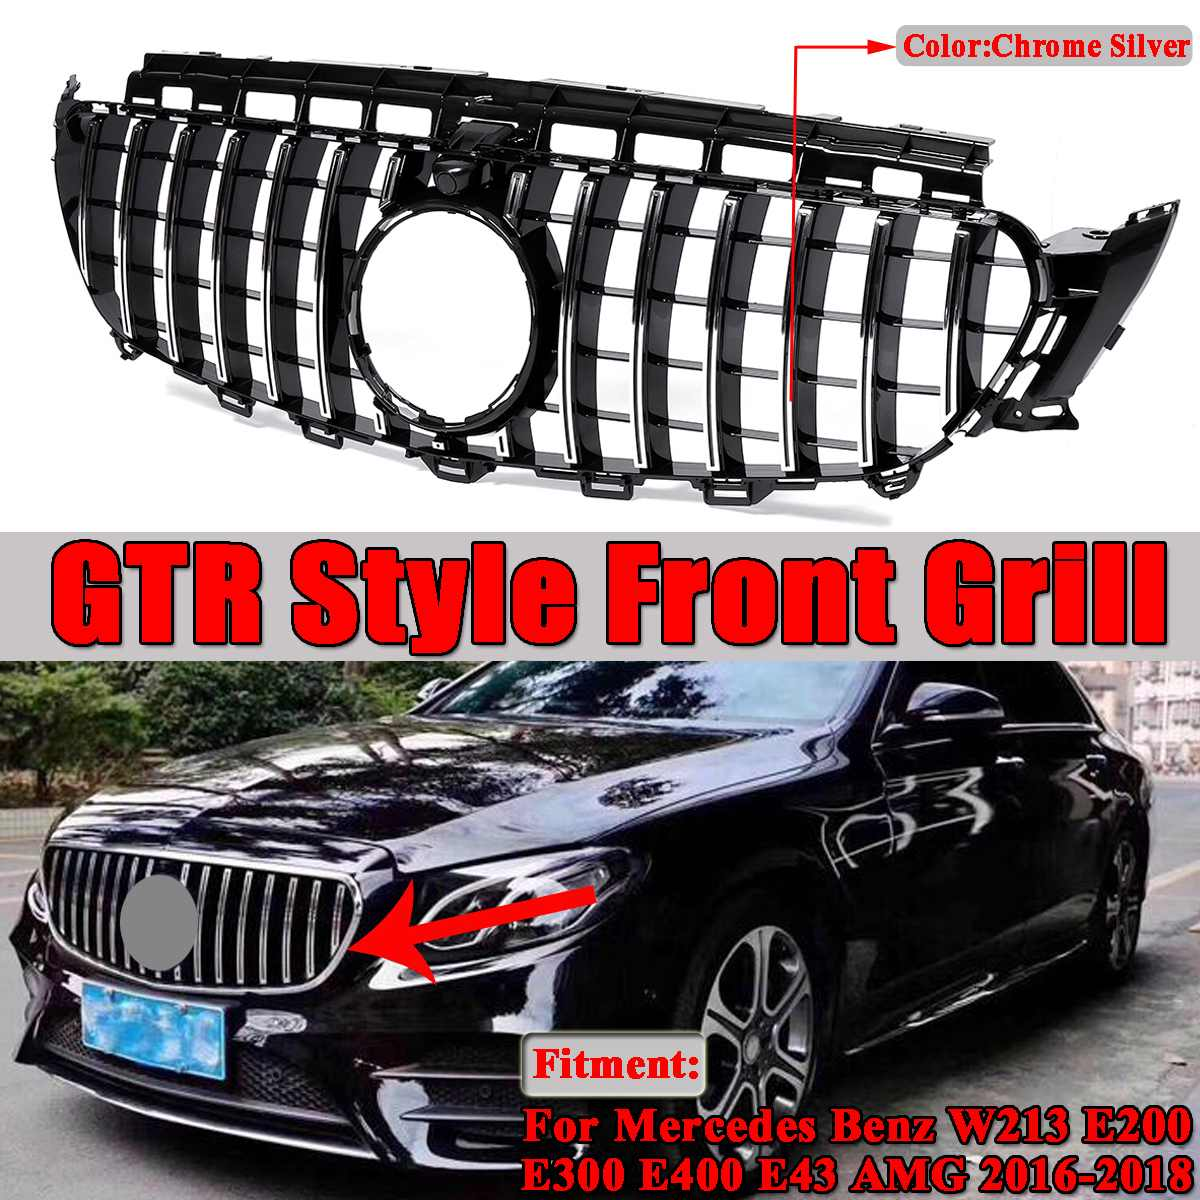 1x GT R/다이아몬드 스타일 W213 Grlil 자동차 프론트 그릴 메르세데스 벤츠 W213 E200 E300 E400 E43 AMG 2016 2017 2018 2019